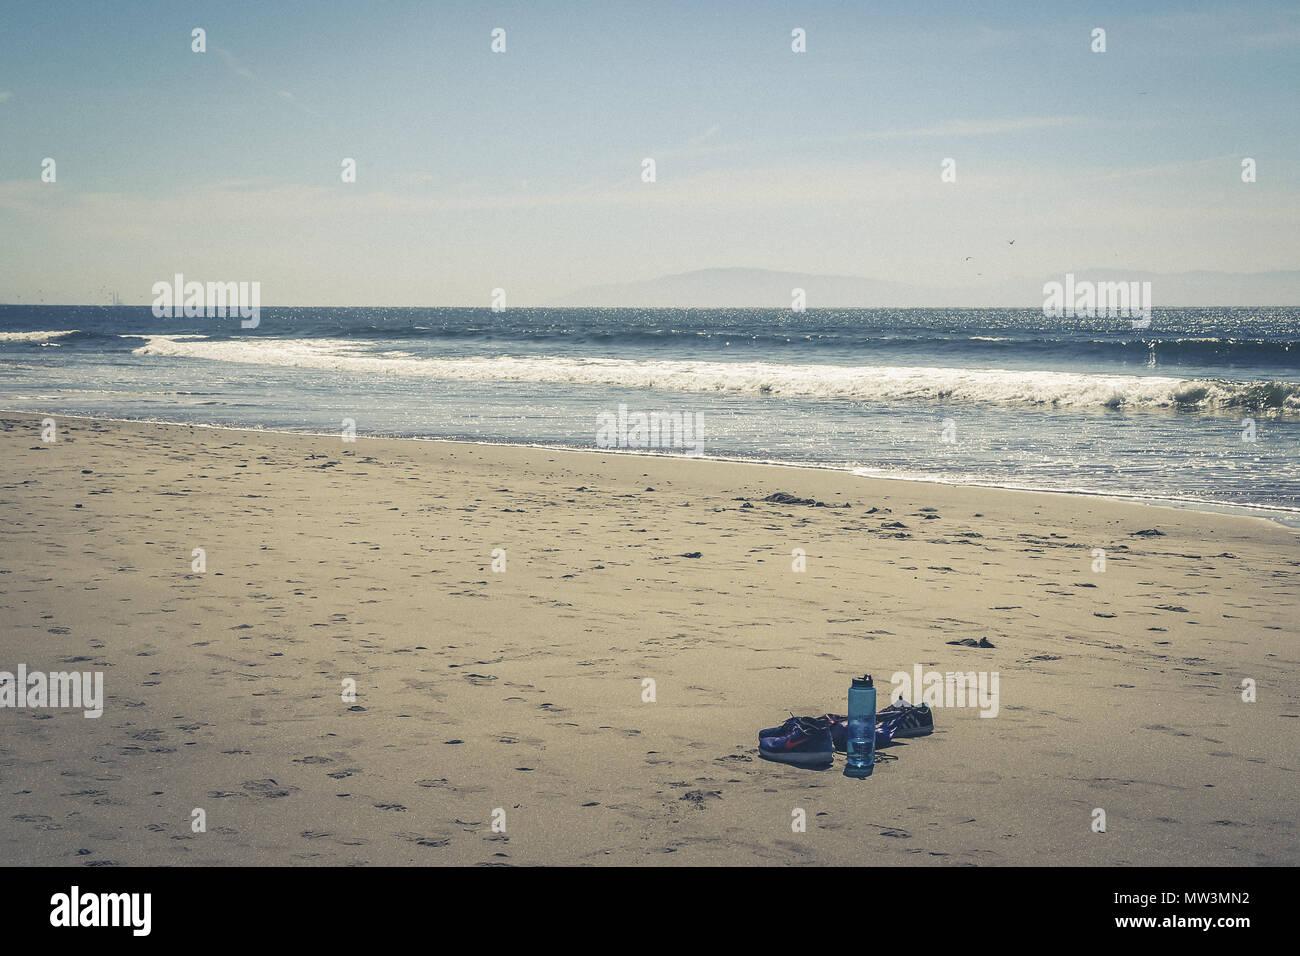 Water bottle and shoes abandoned on santa cruz beach - Stock Image